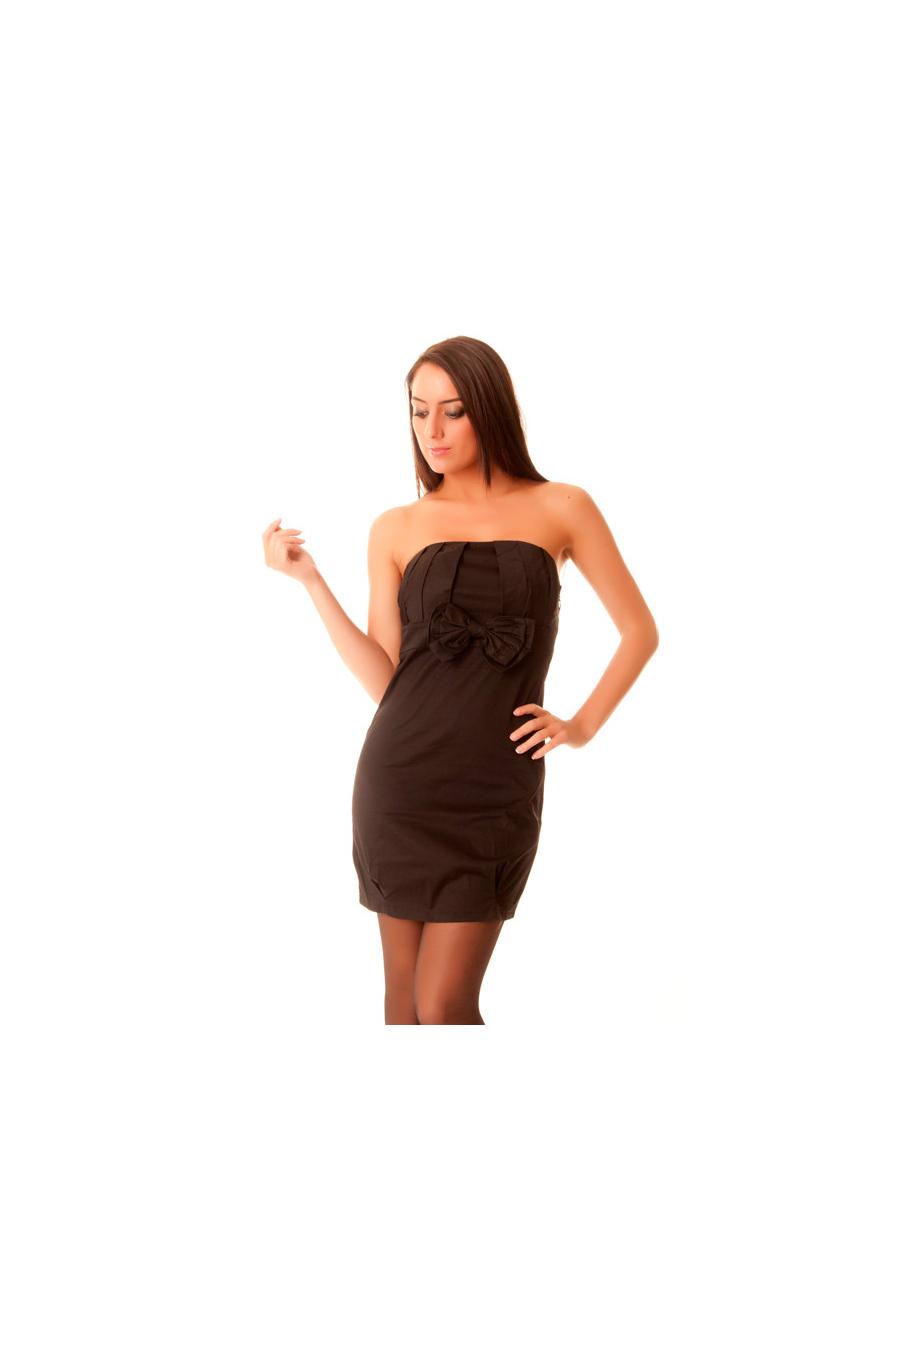 Getailleerde zwarte jurk met vlinderdas. 8290